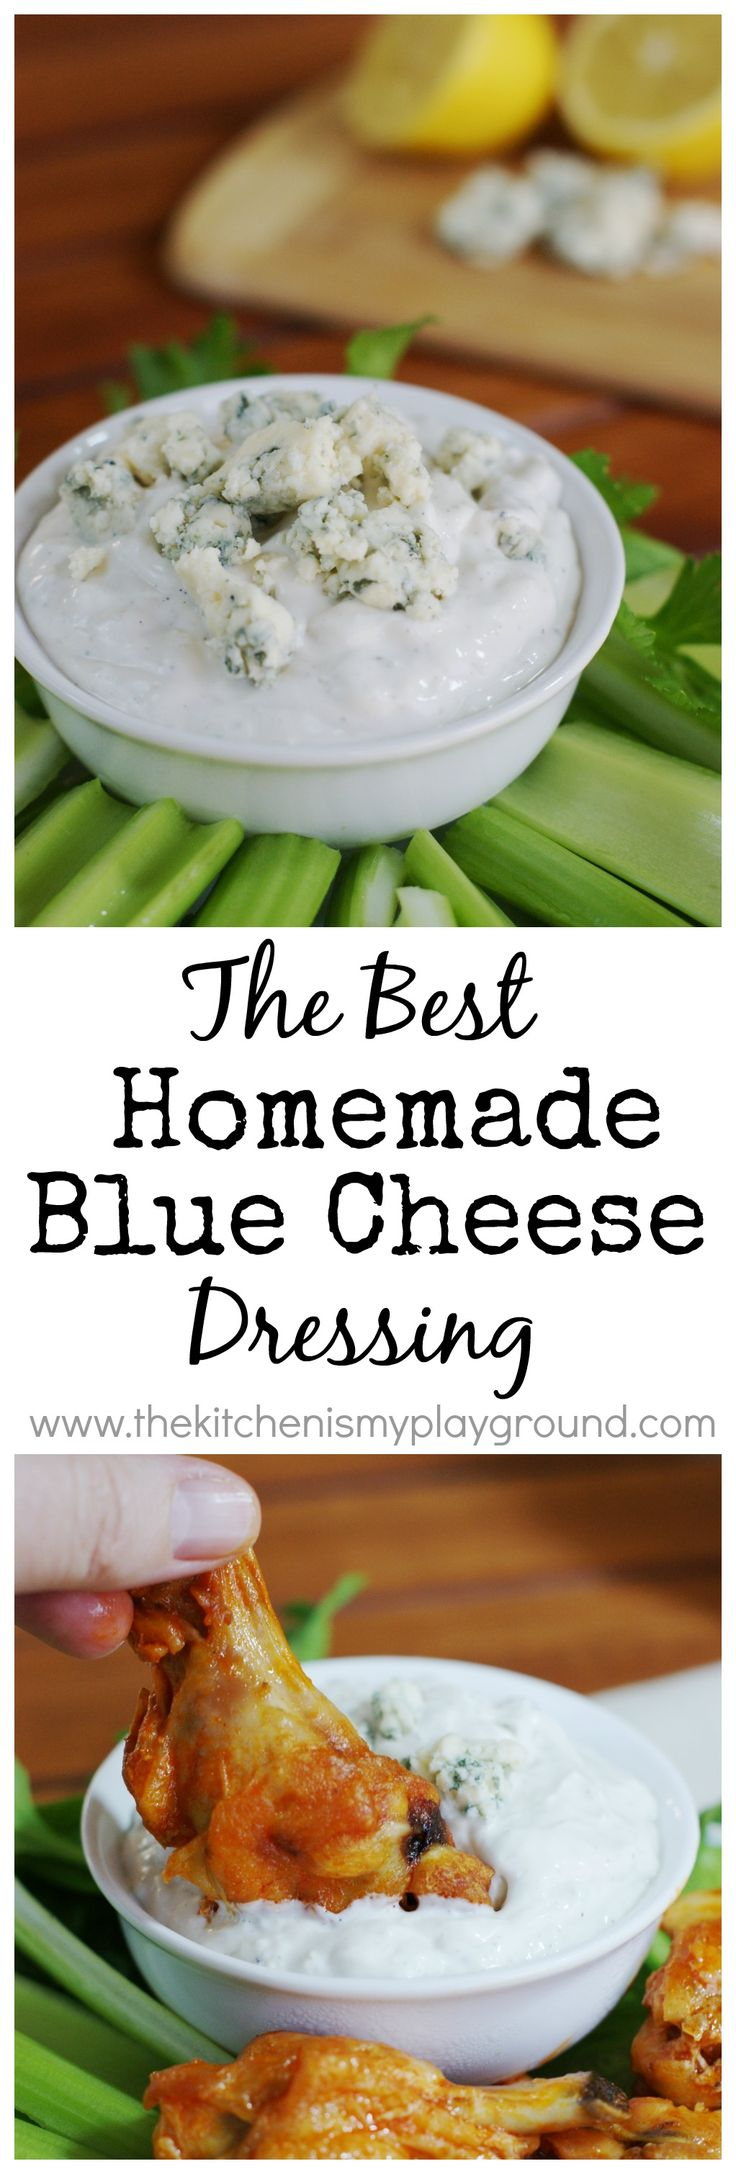 THE BEST Homemade Blue Cheese Dressing {or dip}   www.thekitchenismyplayground.com